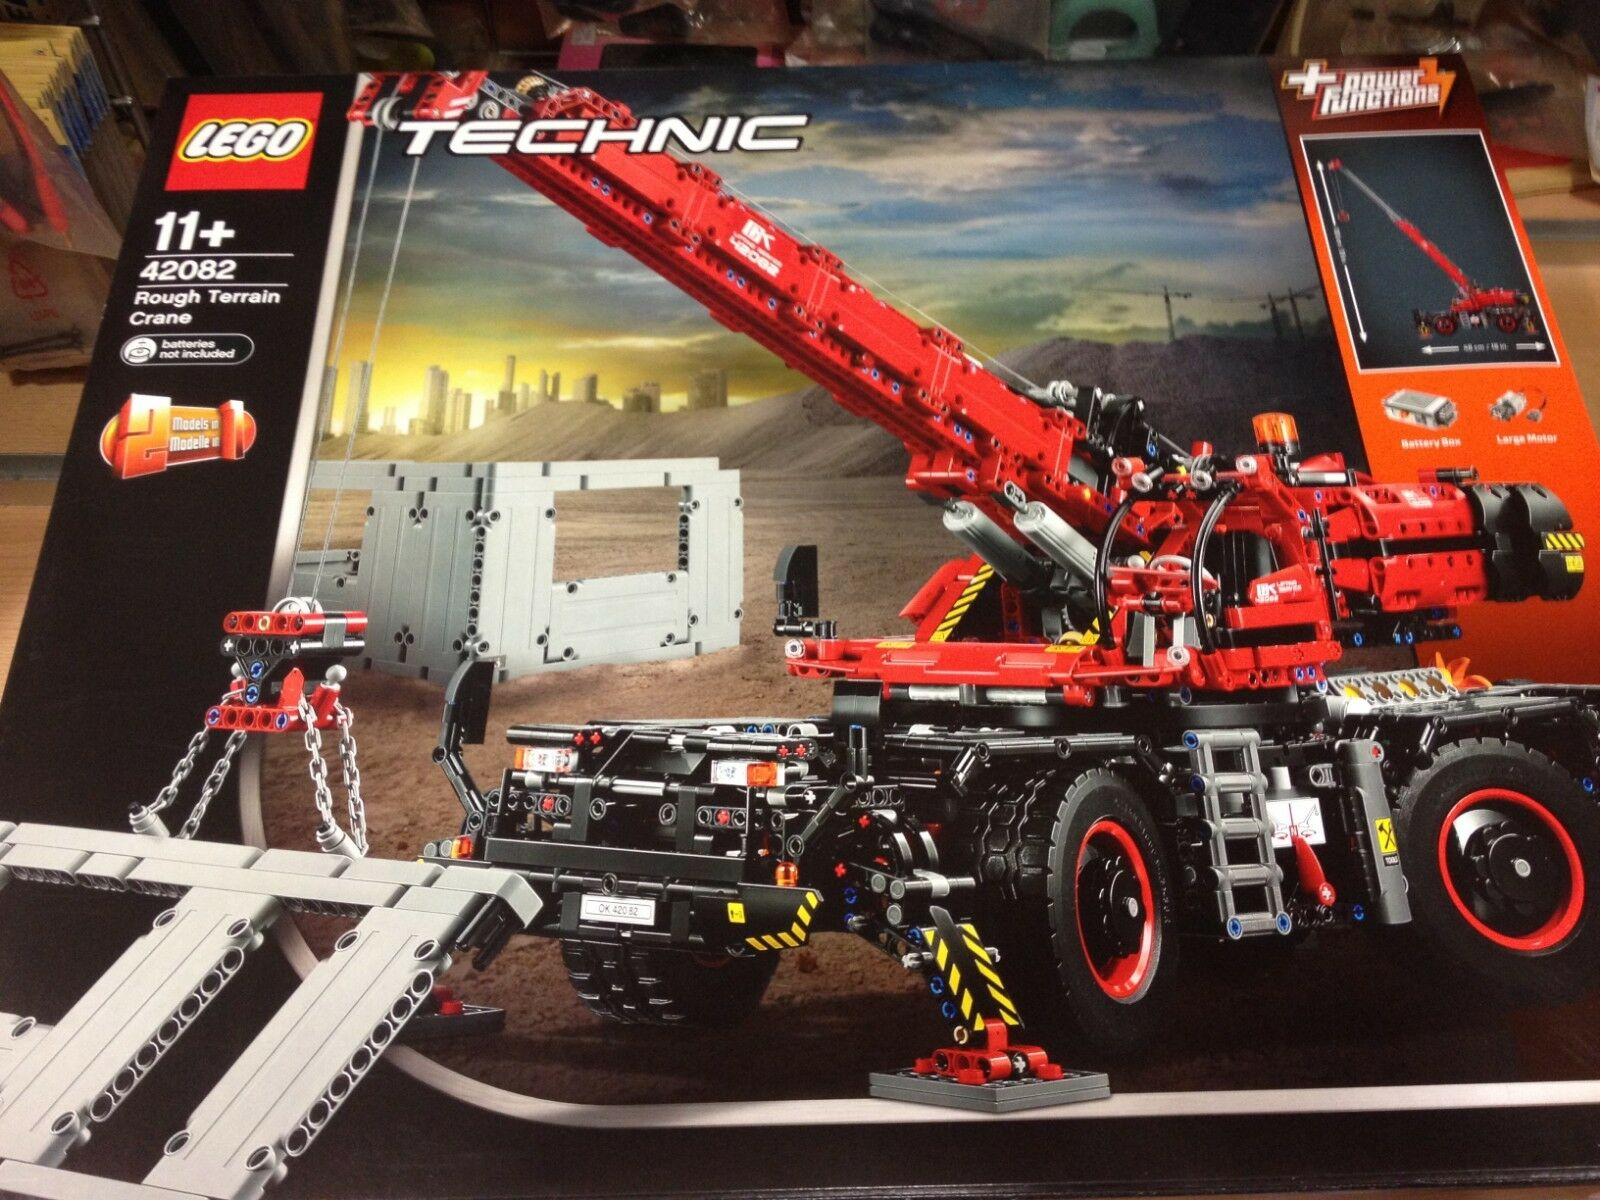 Grua Todo Terreno Lego Technic Referencia 42082